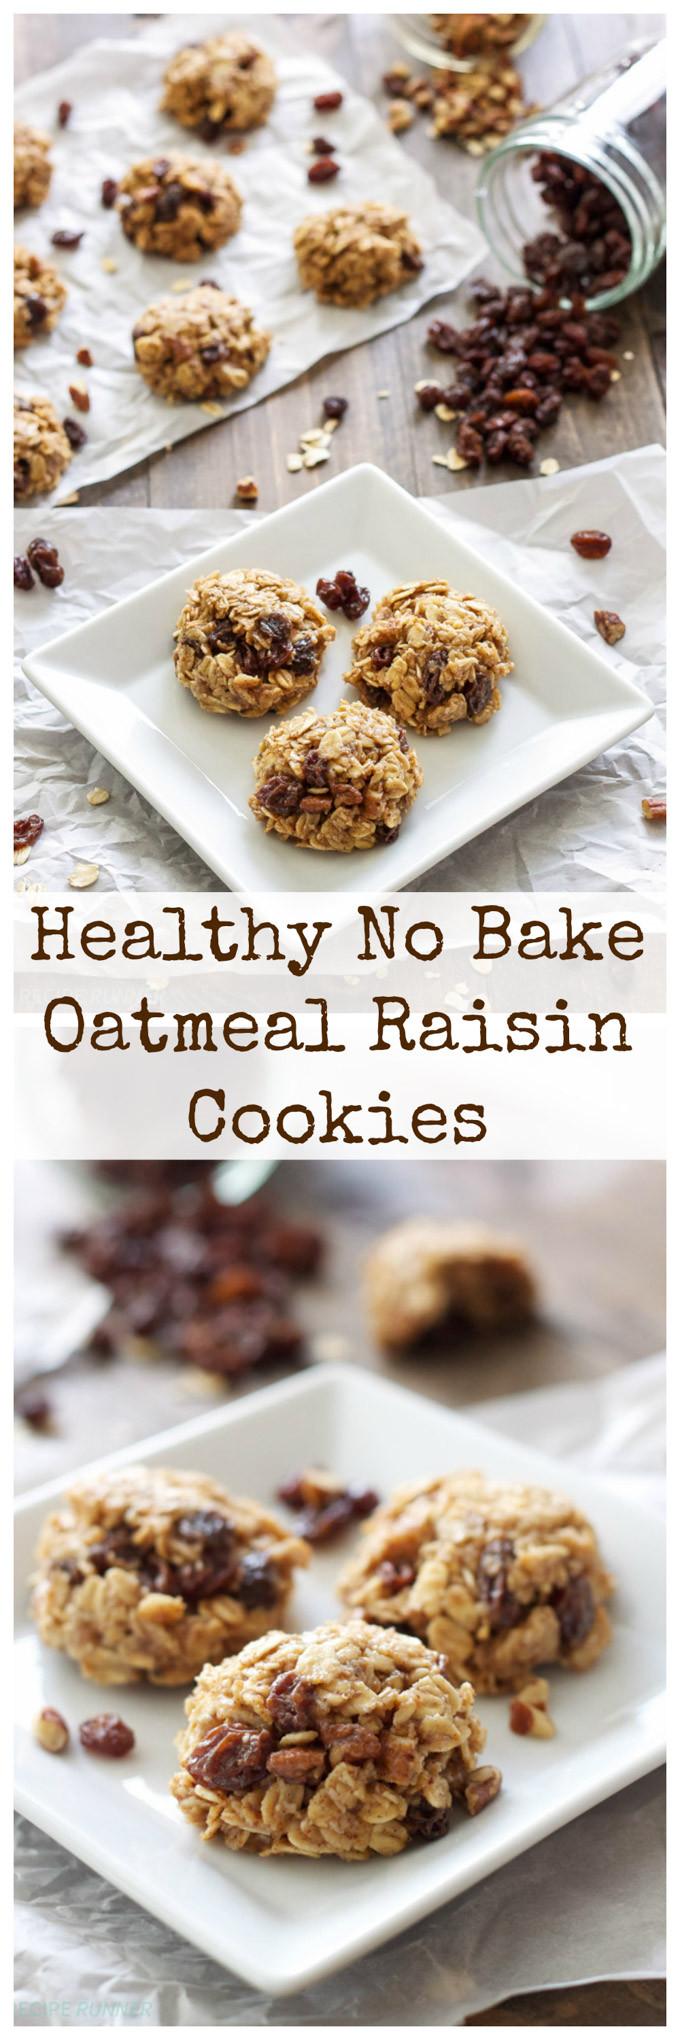 Oatmeal Raisin Cookies Recipe Healthy  Healthy No Bake Oatmeal Raisin Cookies Recipe Runner